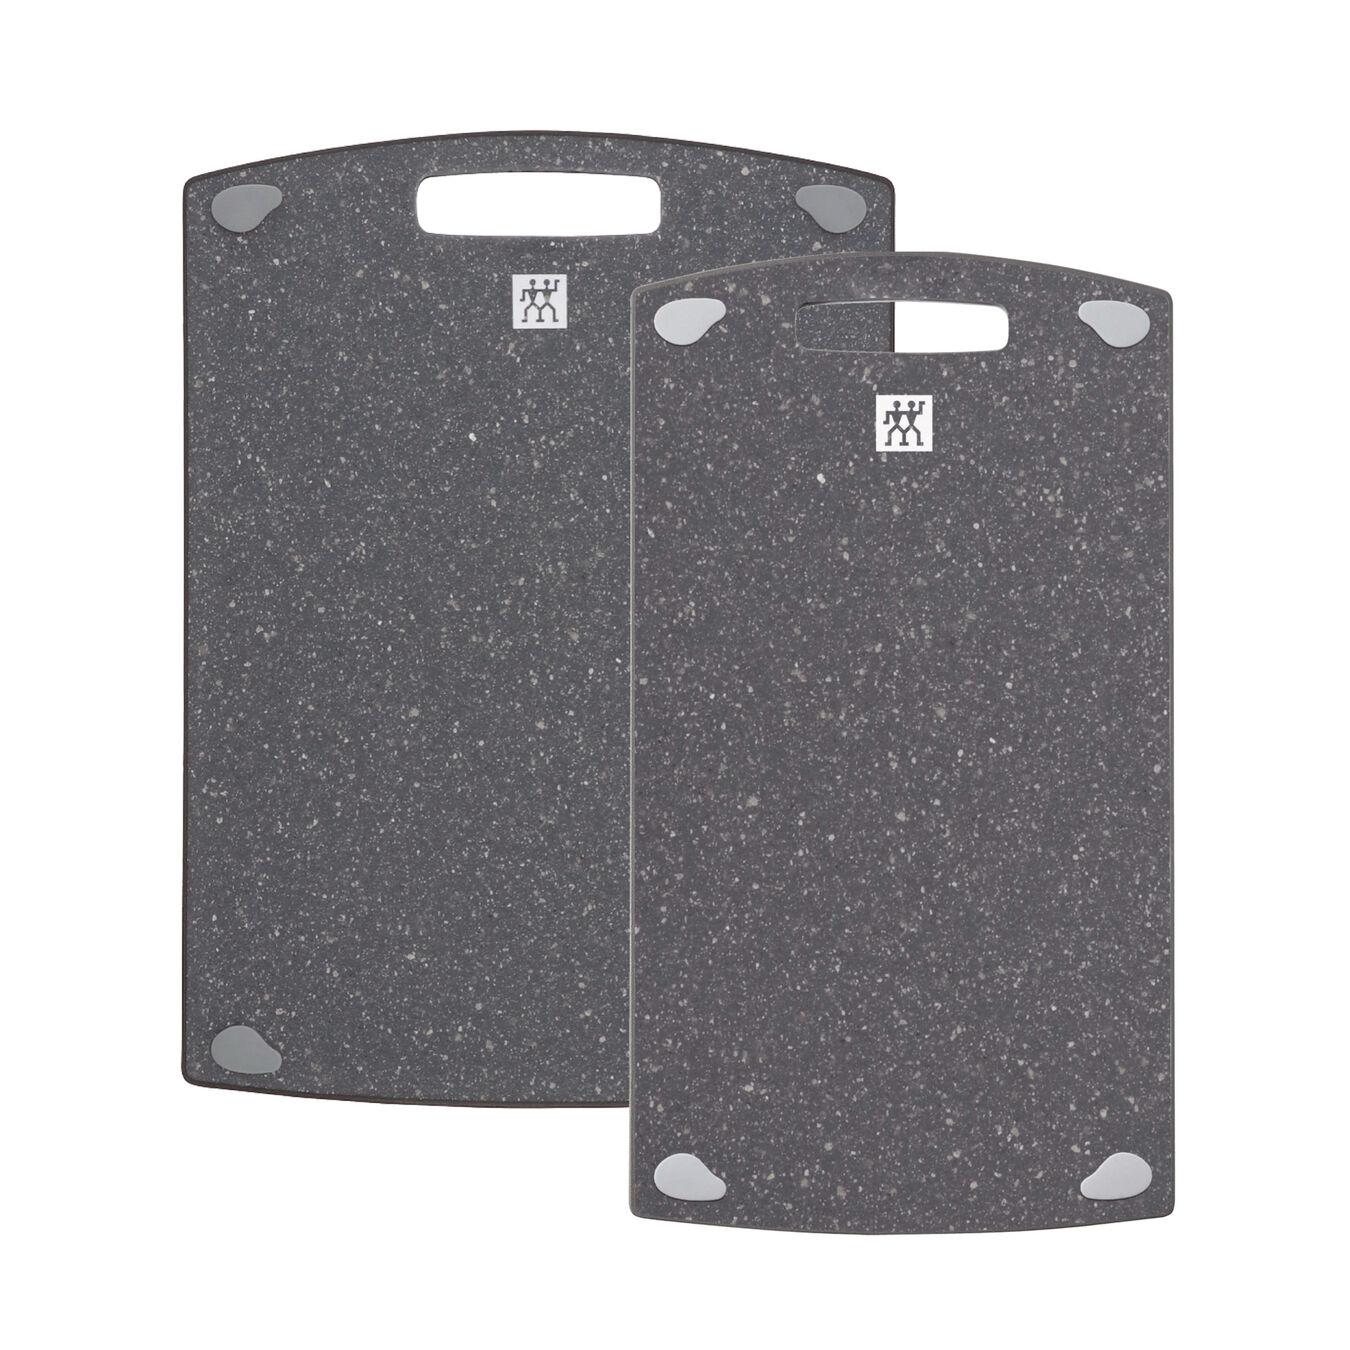 2 pc. Cutting board set, Plastic | 36 cm x 20 cm & 37 cm x 27 cm 36 cm x 20 cm,,large 1